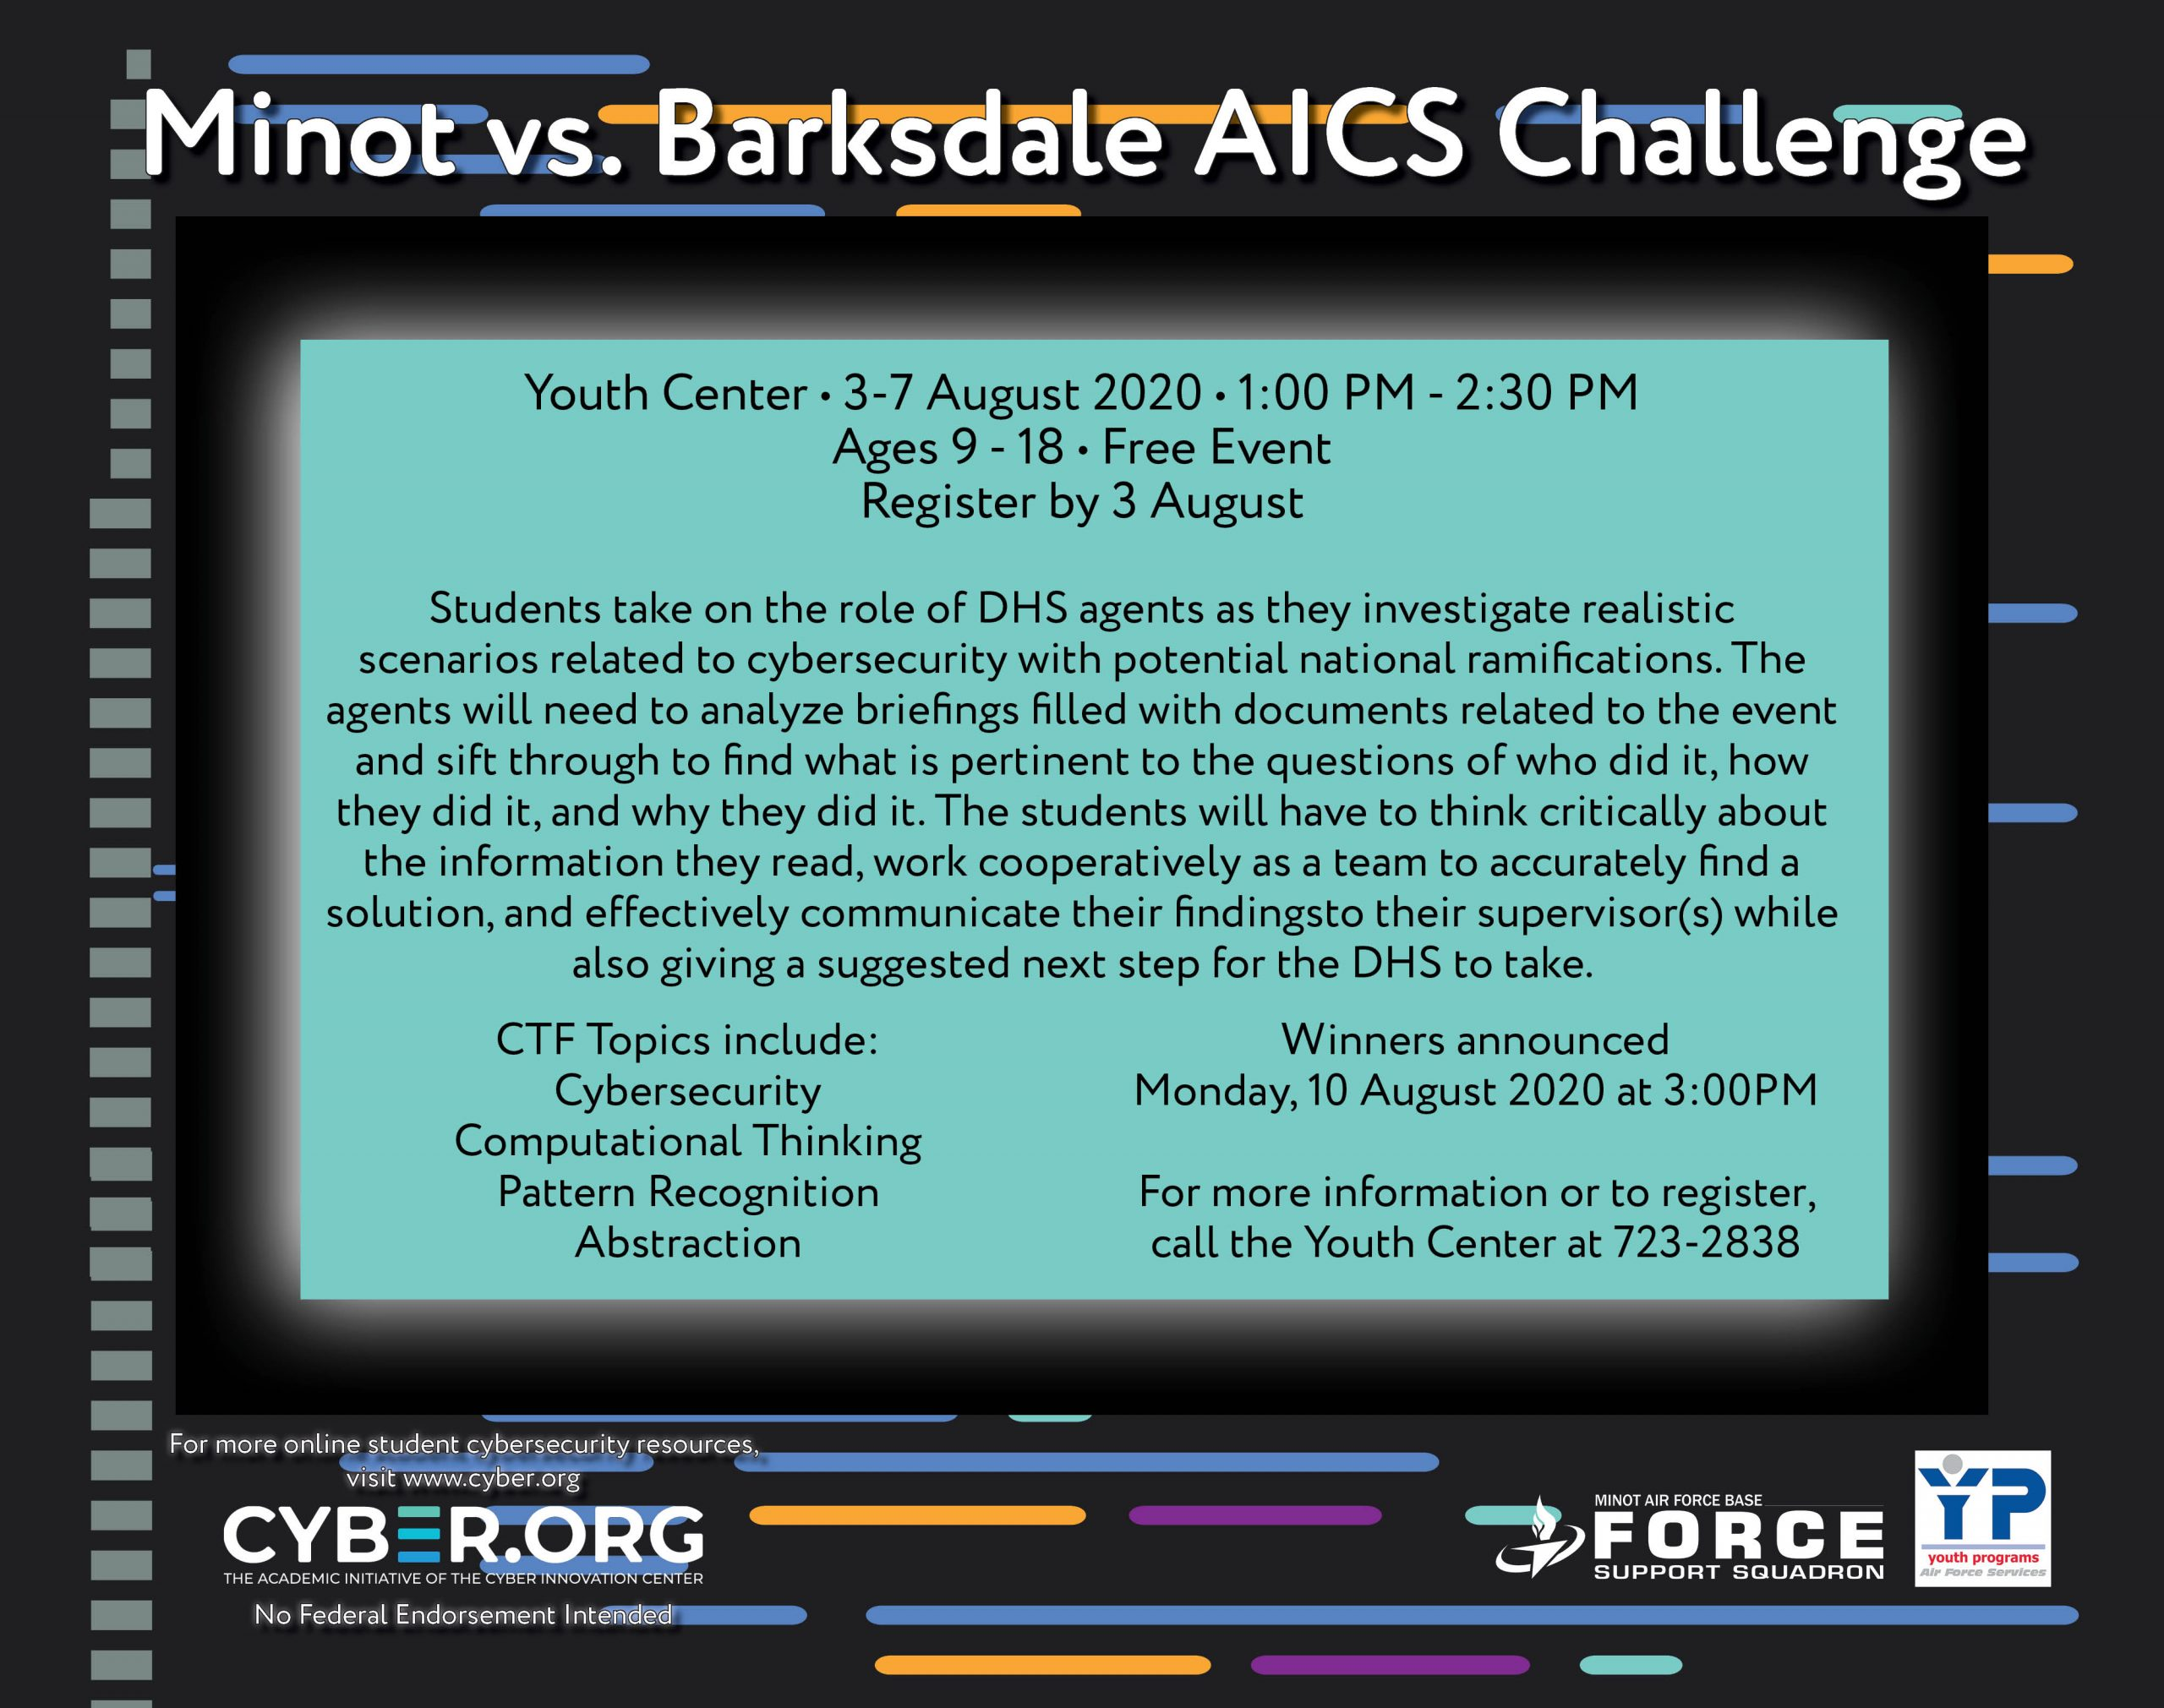 Minot vs. Barksdale AICS Challenge